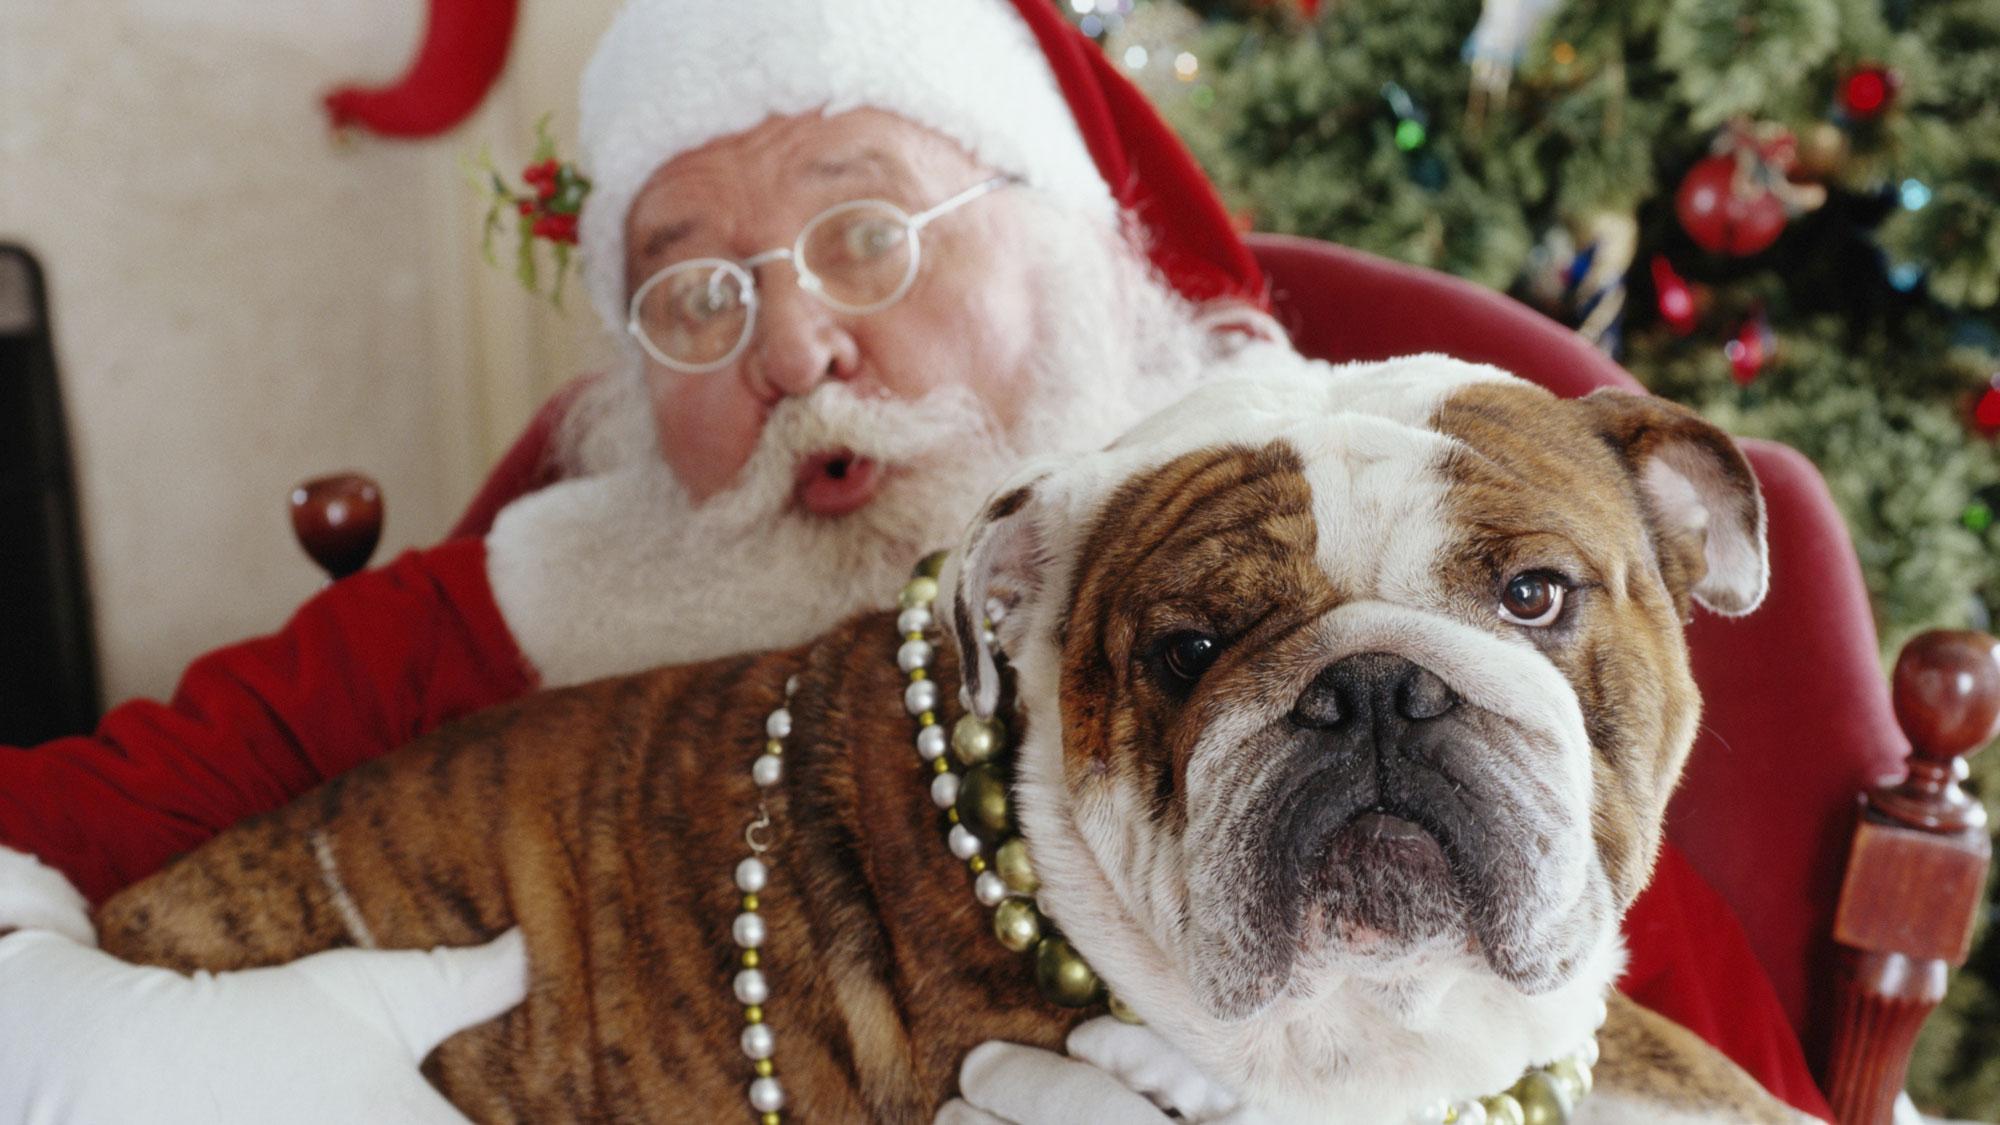 English bulldog lying on Santa's lap. GETTY IMAGES/LWA